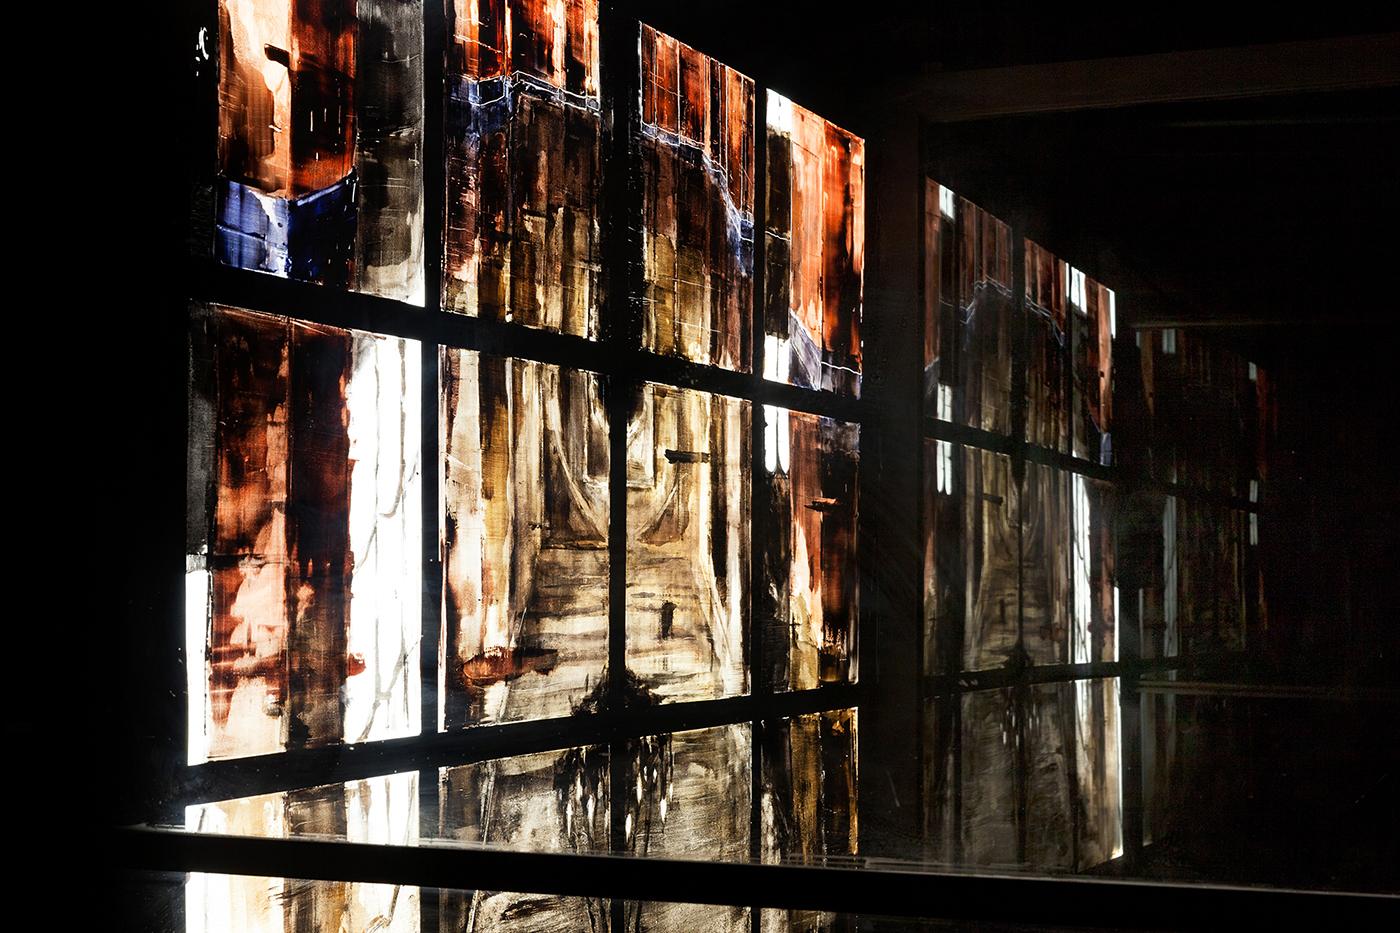 MATIÈRE NOIRE, exhibition by Gonzalo Borondo in Marseille, France Artes & contextos Matière Noire Borondo @ Blind Eye Factory